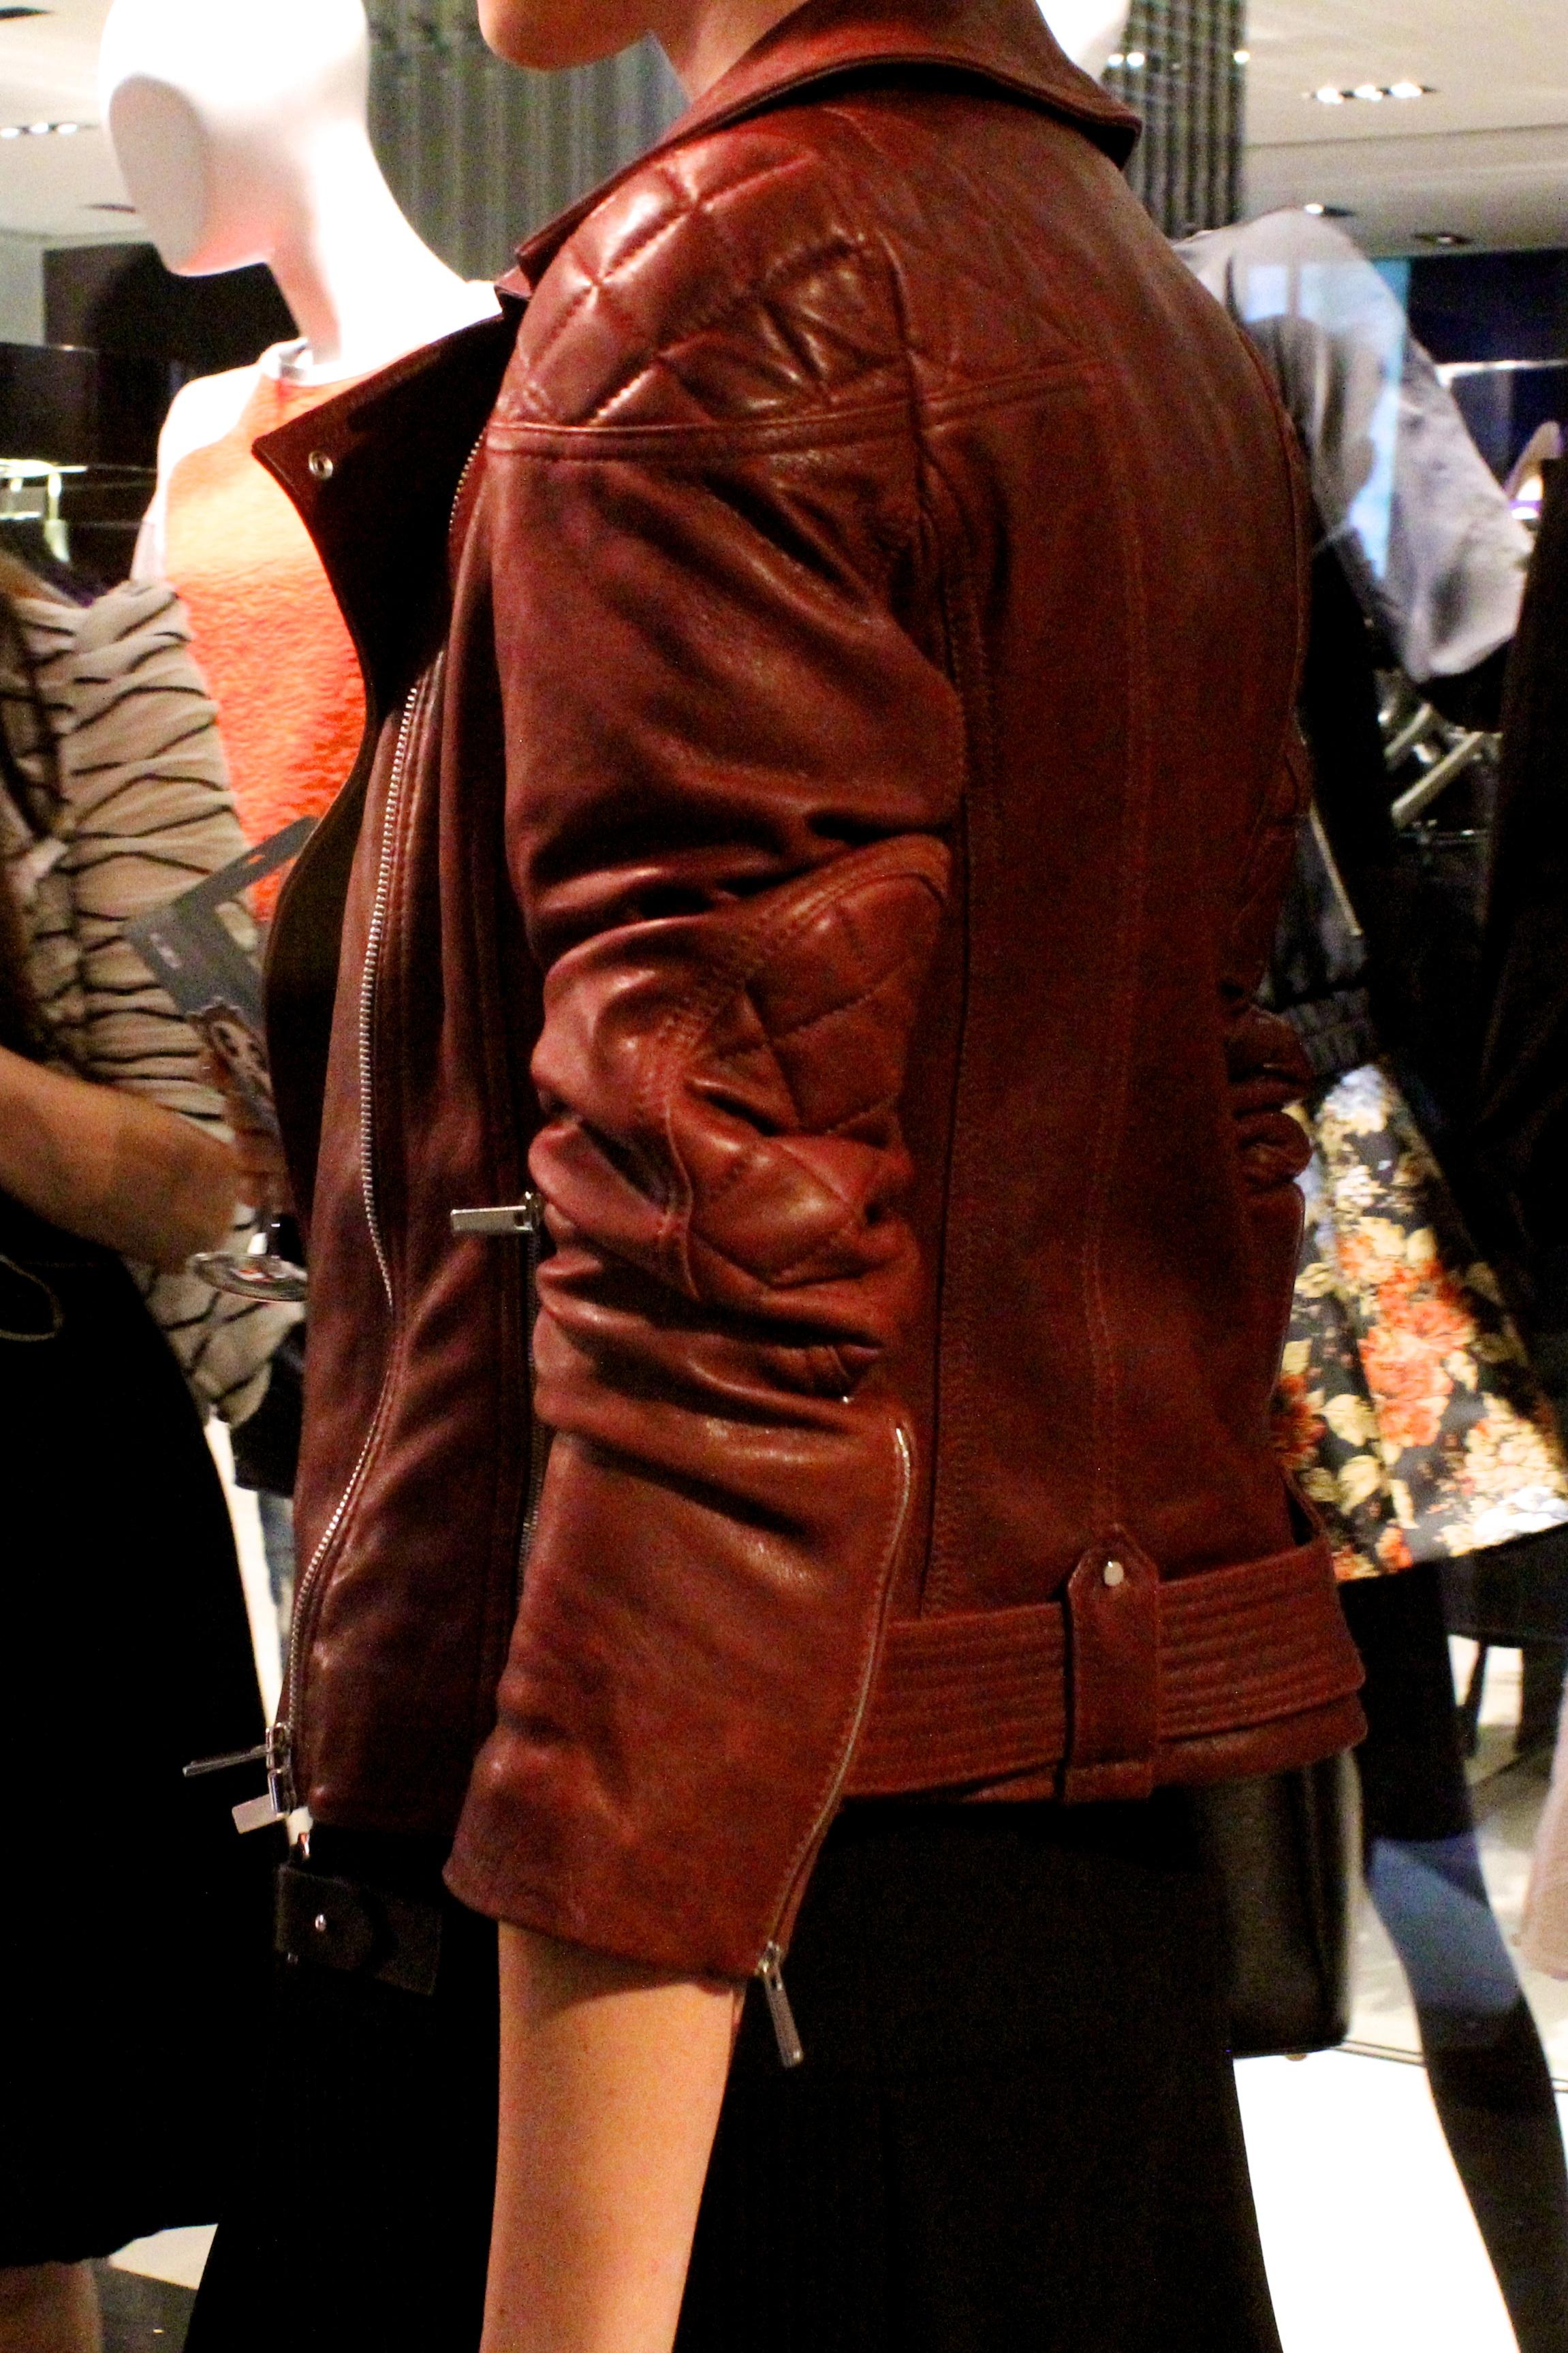 Jacket:  S  ignature leather biker jacket